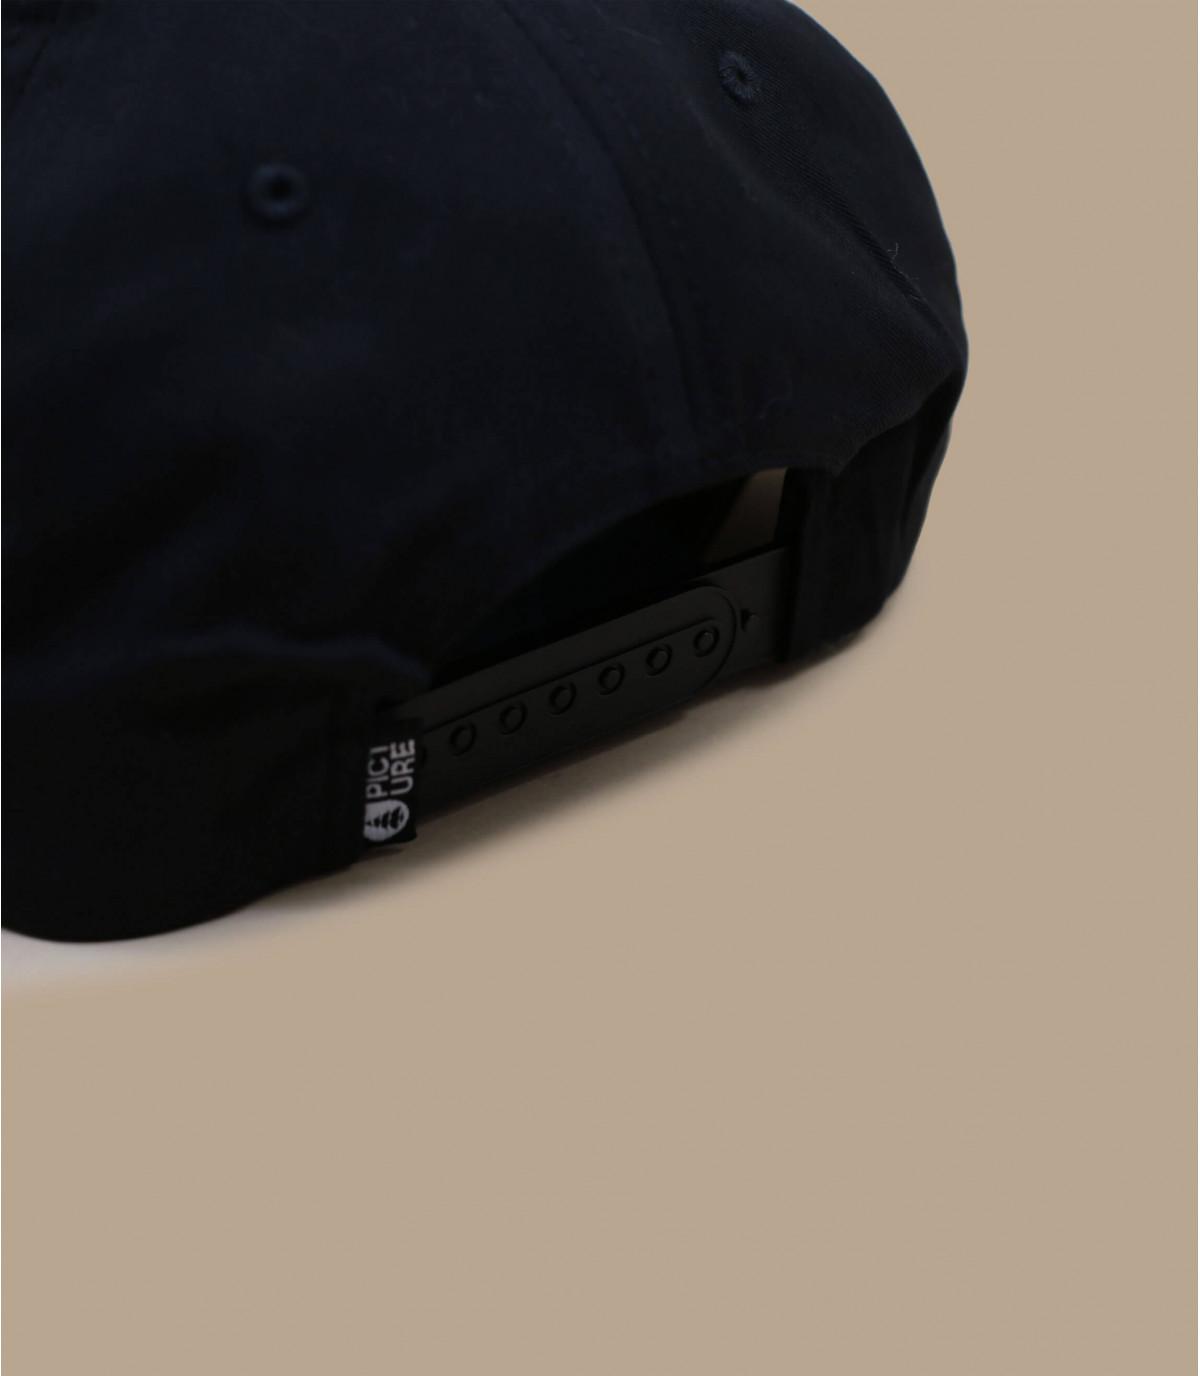 Details Narrow black - Abbildung 3